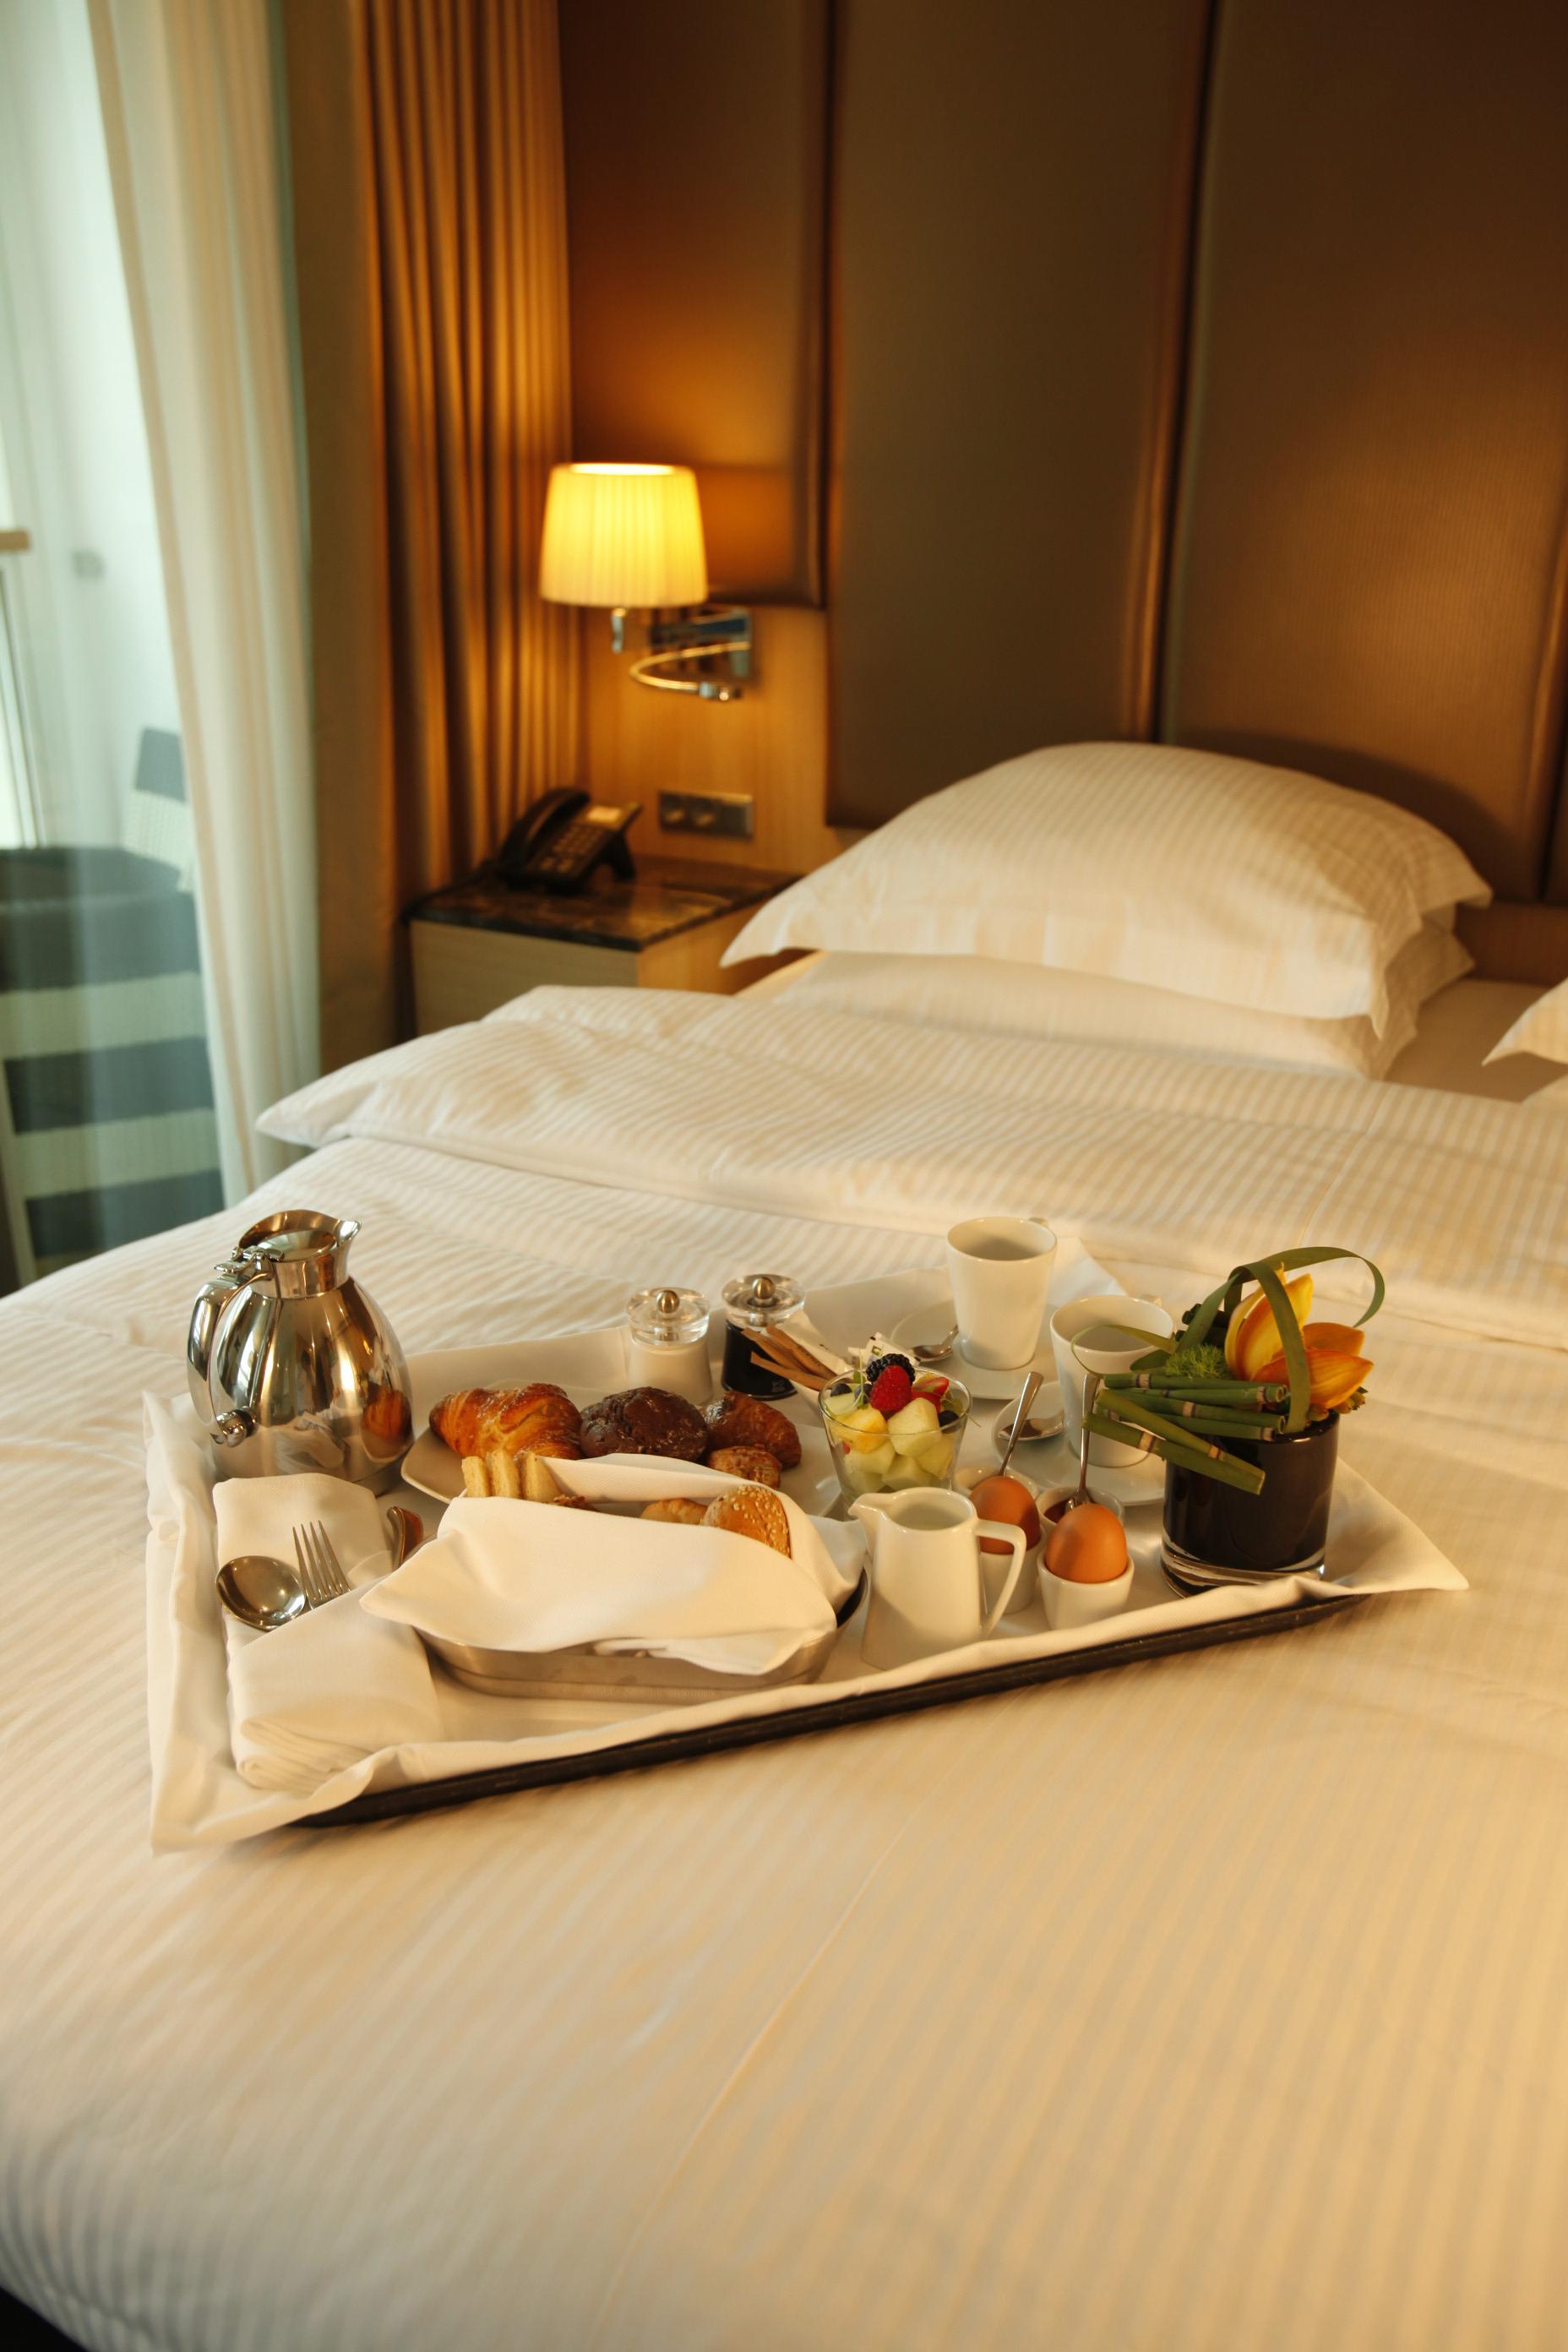 Scenic Jasper Room Service Dining _MG_9760r.jpg